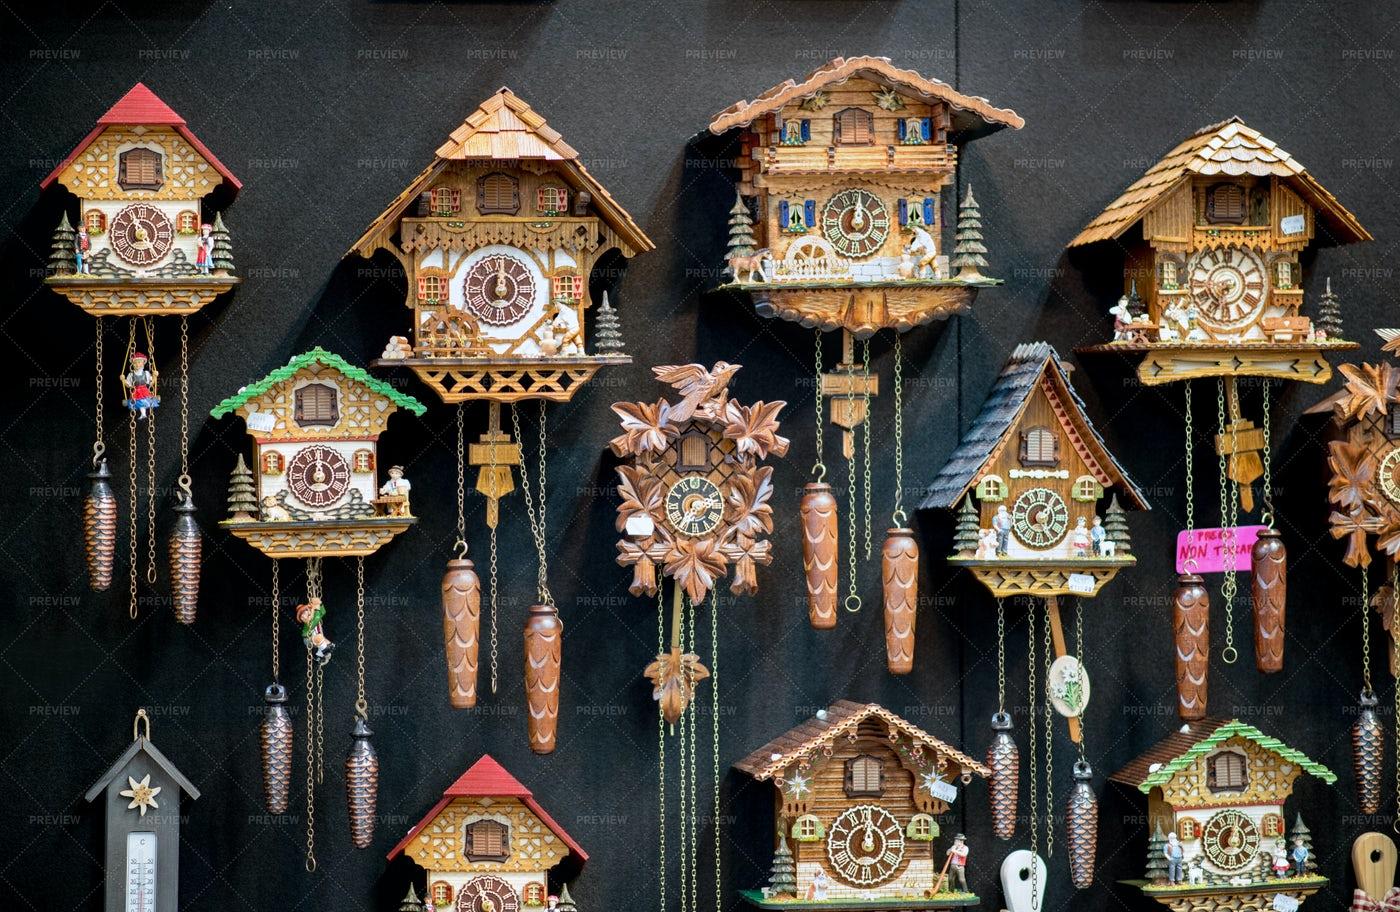 Decorative Pendulum Clocks: Stock Photos